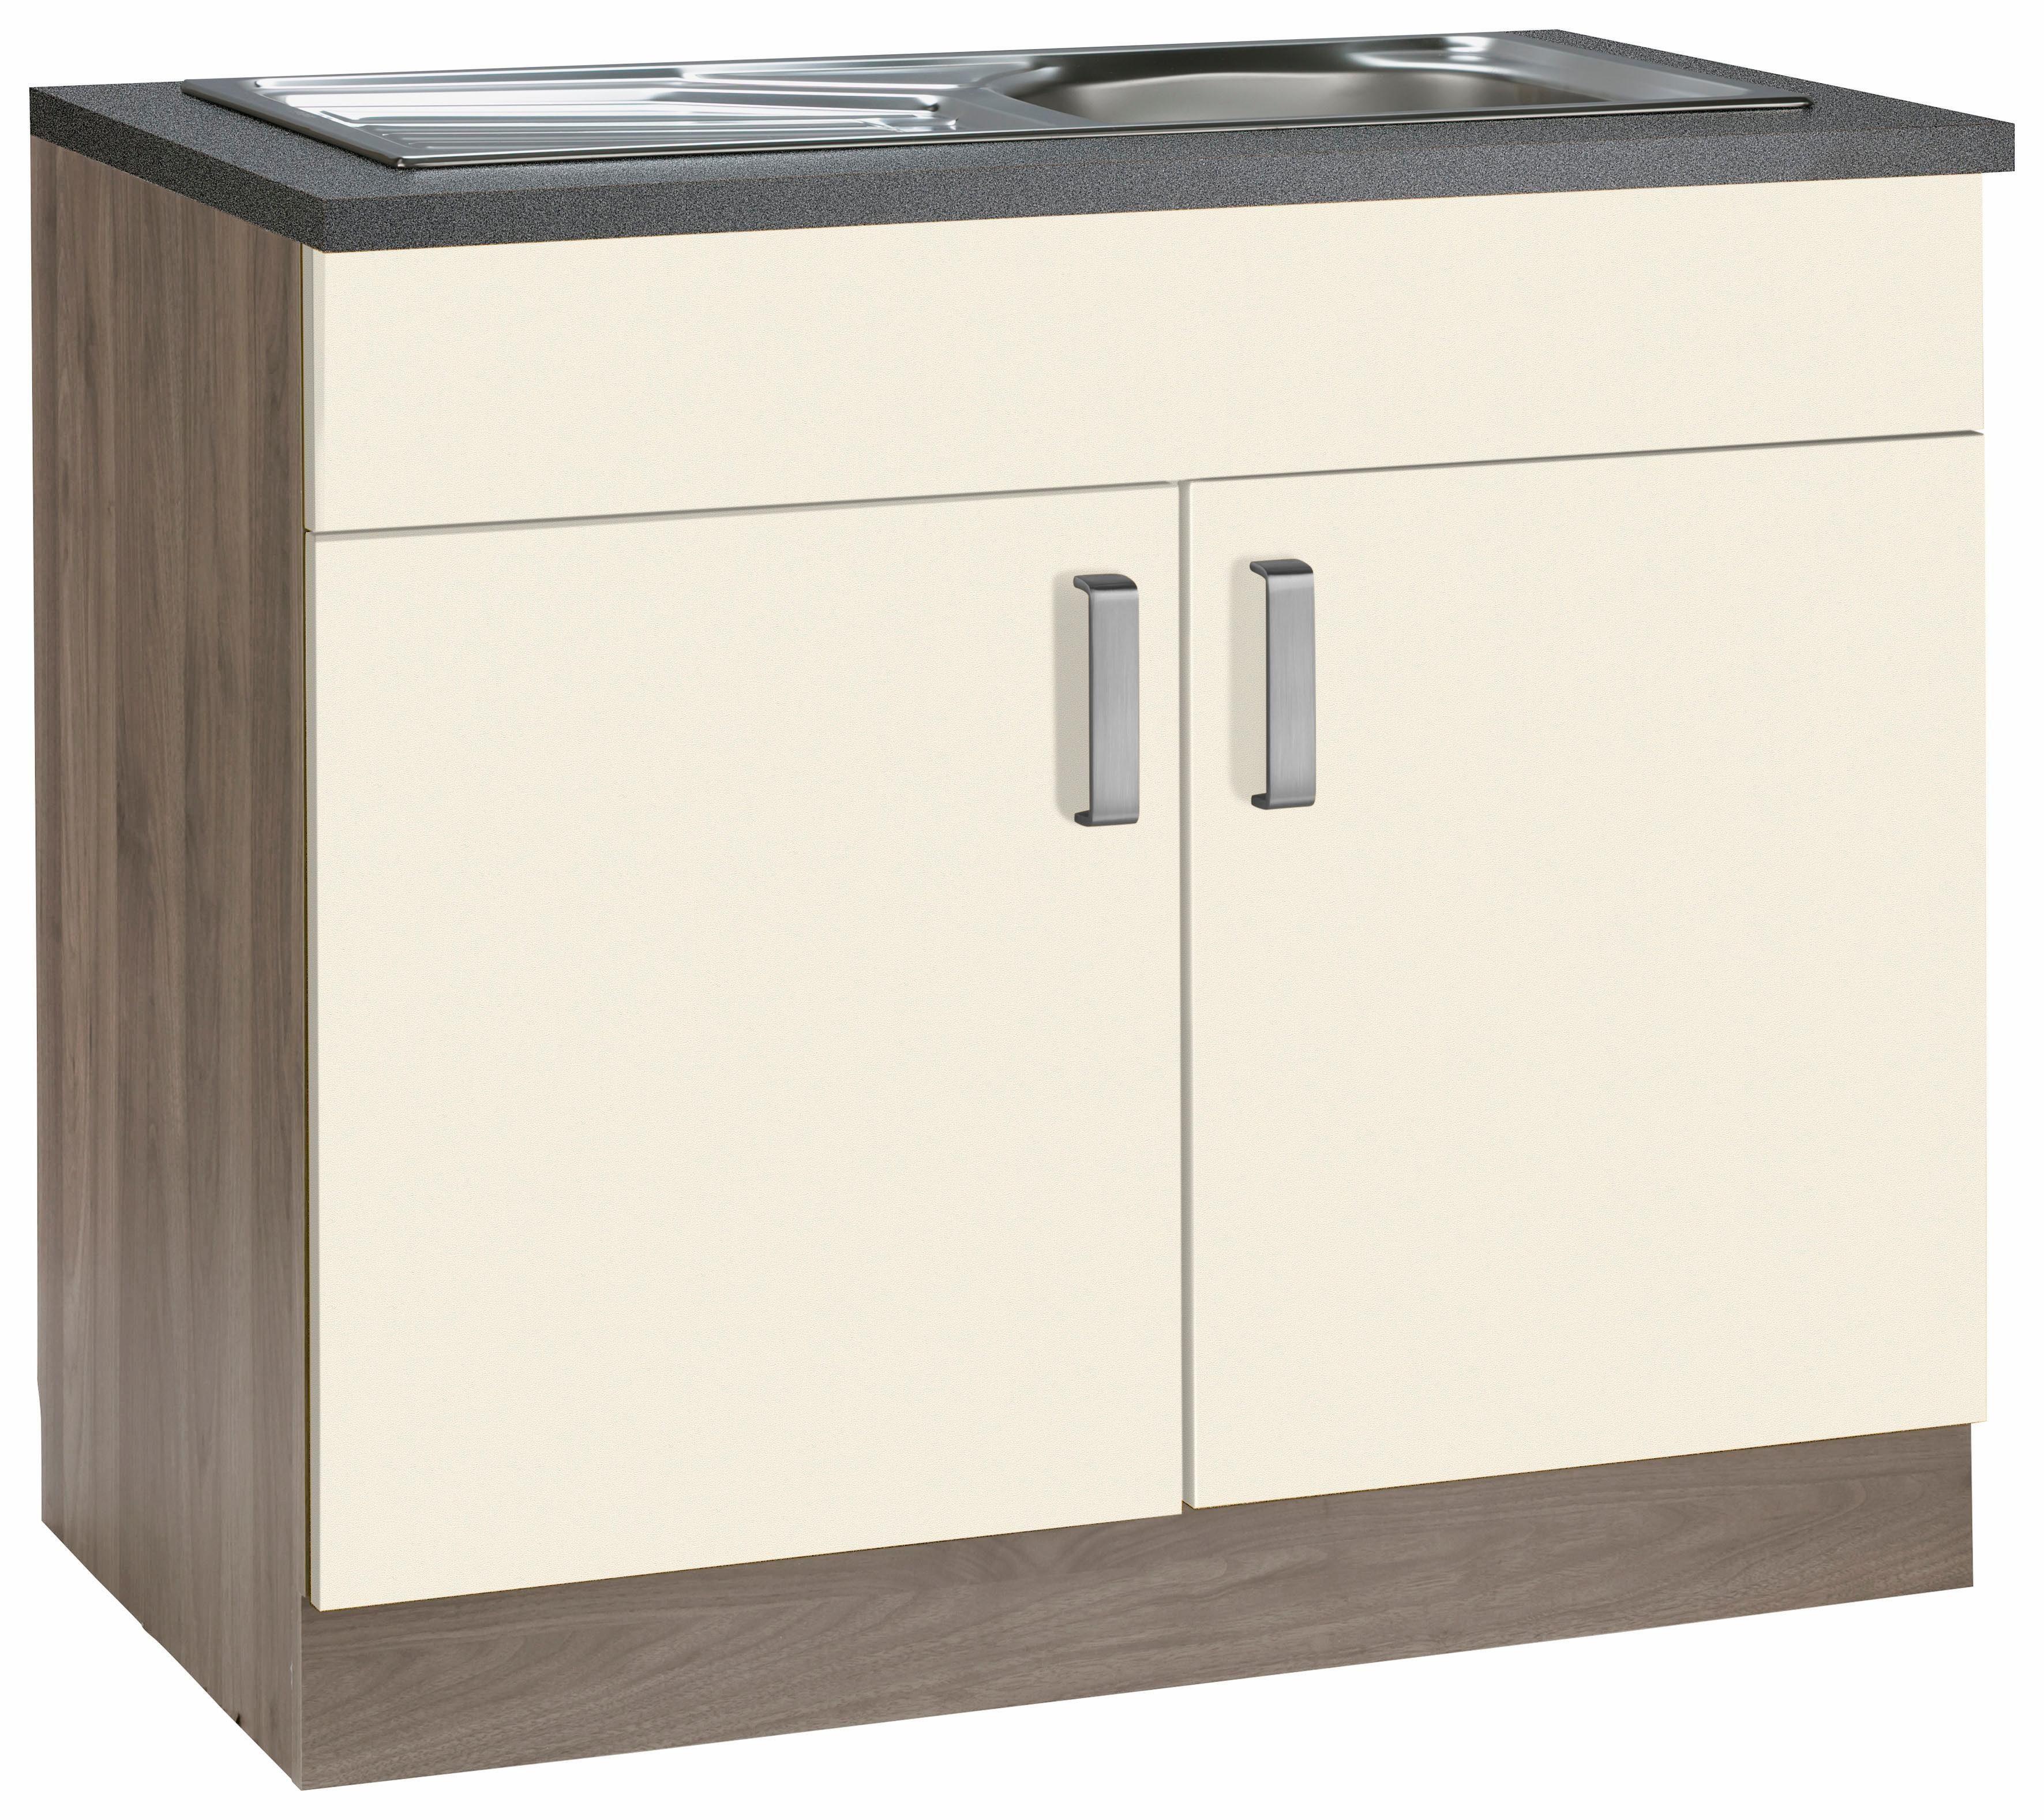 sp lenunterschrank 100 cm breit rc55 hitoiro. Black Bedroom Furniture Sets. Home Design Ideas